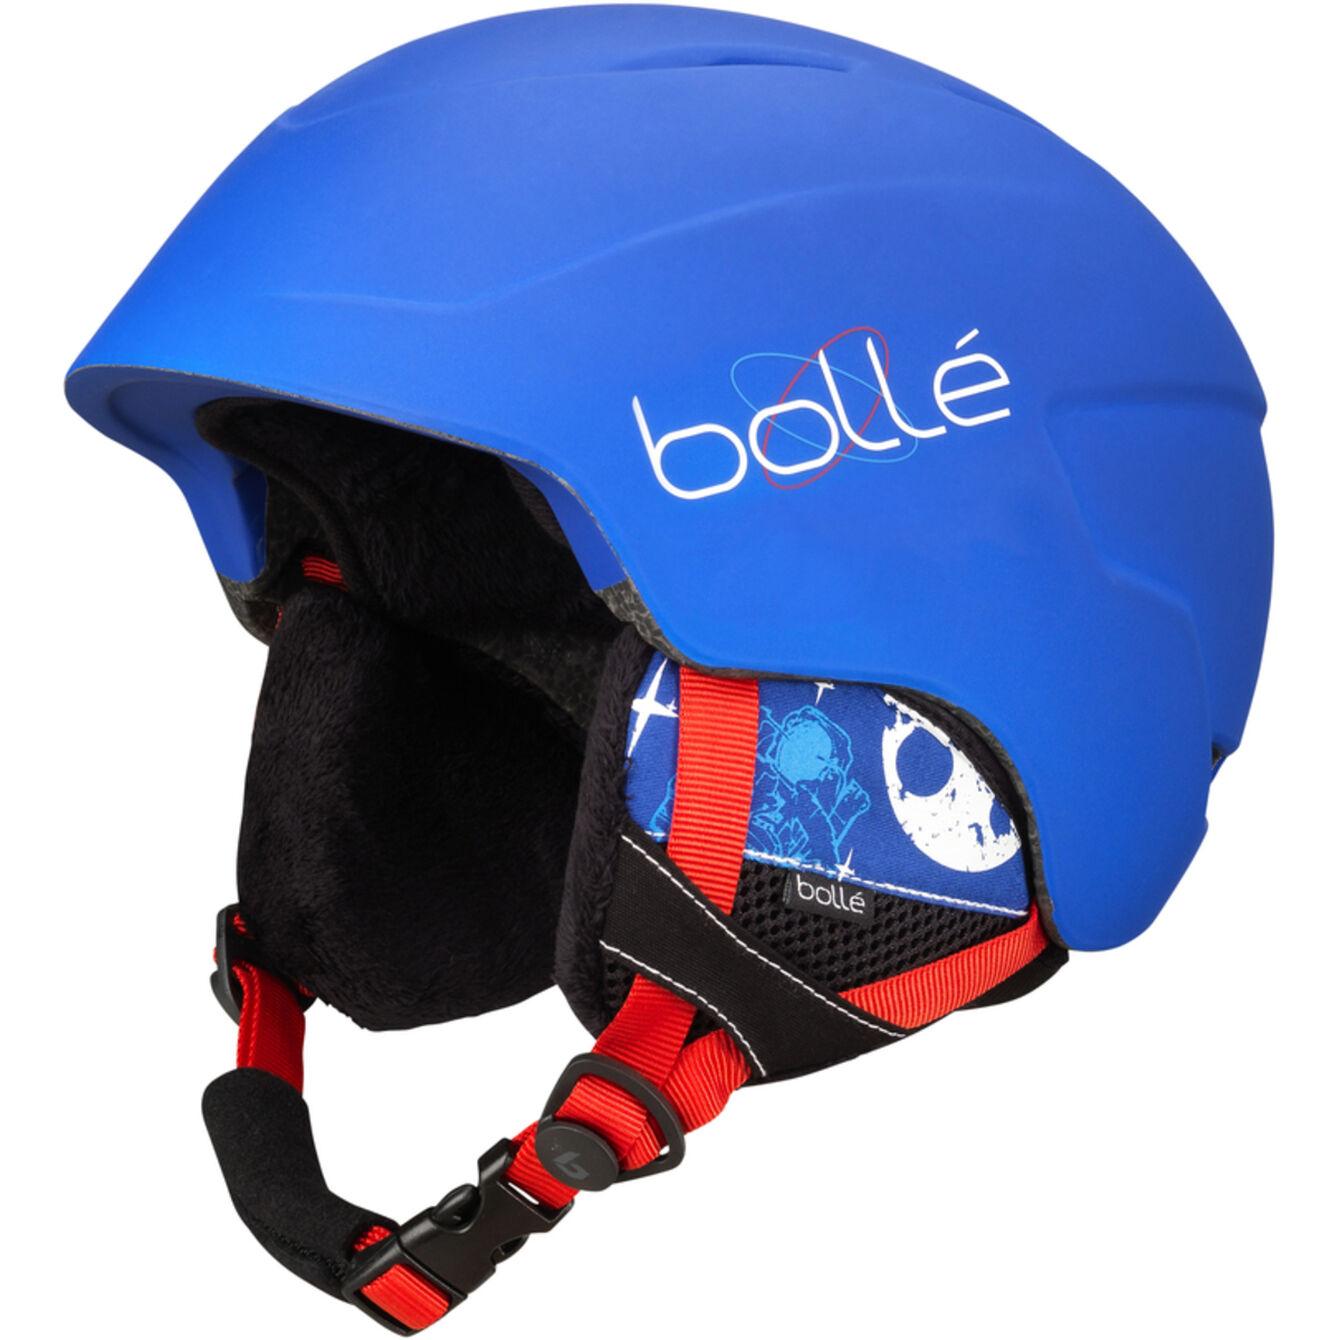 BOLLÈ B-LIEVE MATTE NAVY AEROSPACE S/M 53-57CM